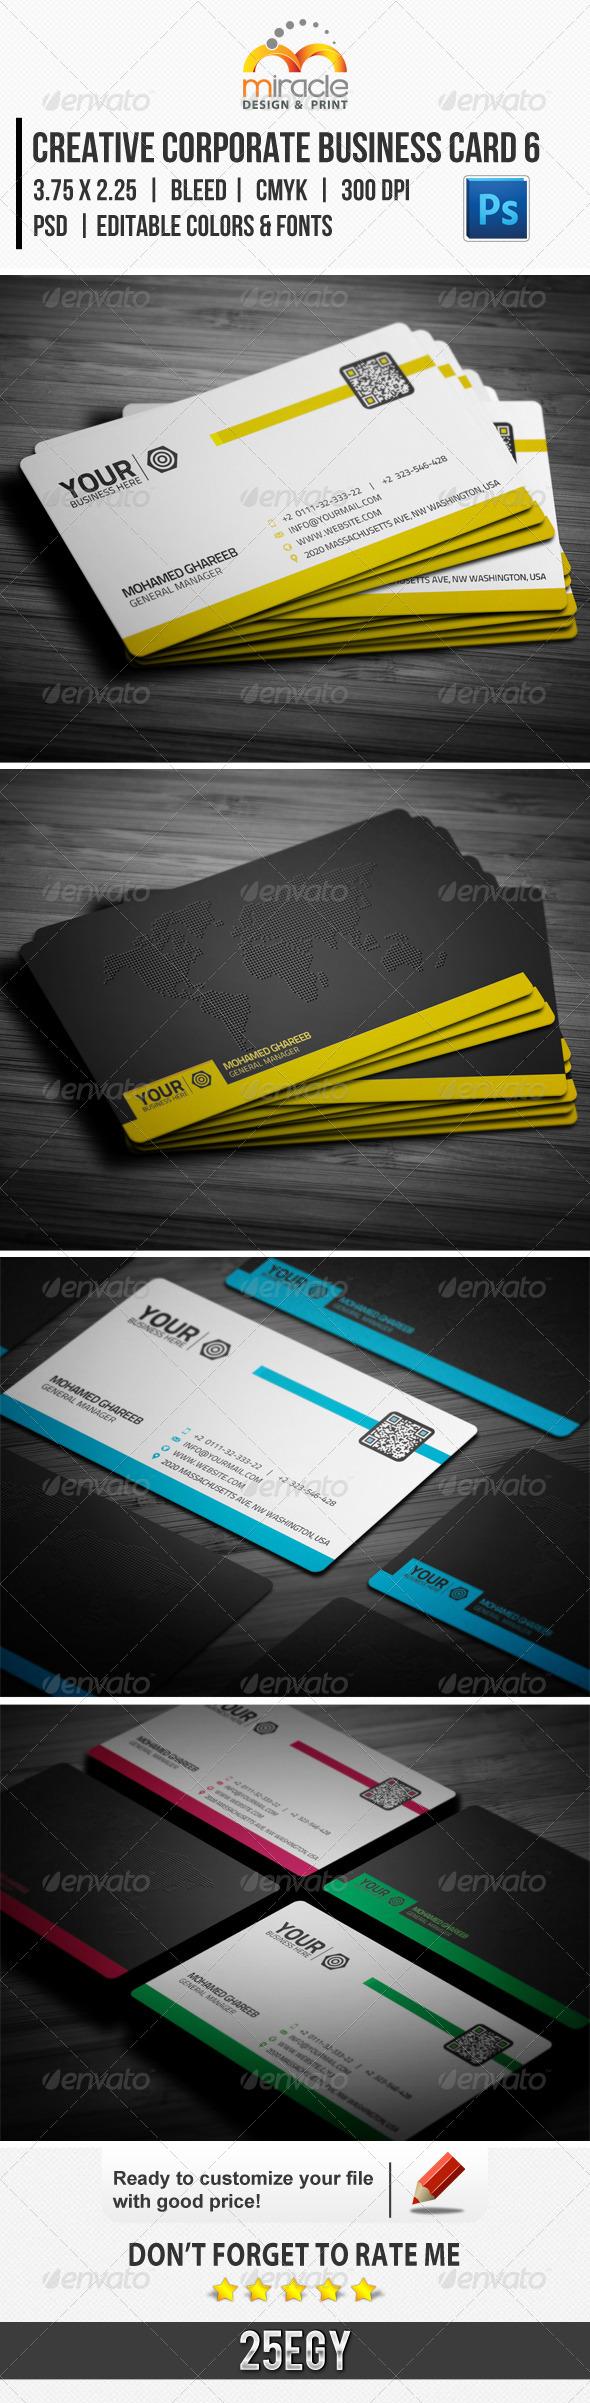 Creative Corporate Business Card 6 - Corporate Business Cards